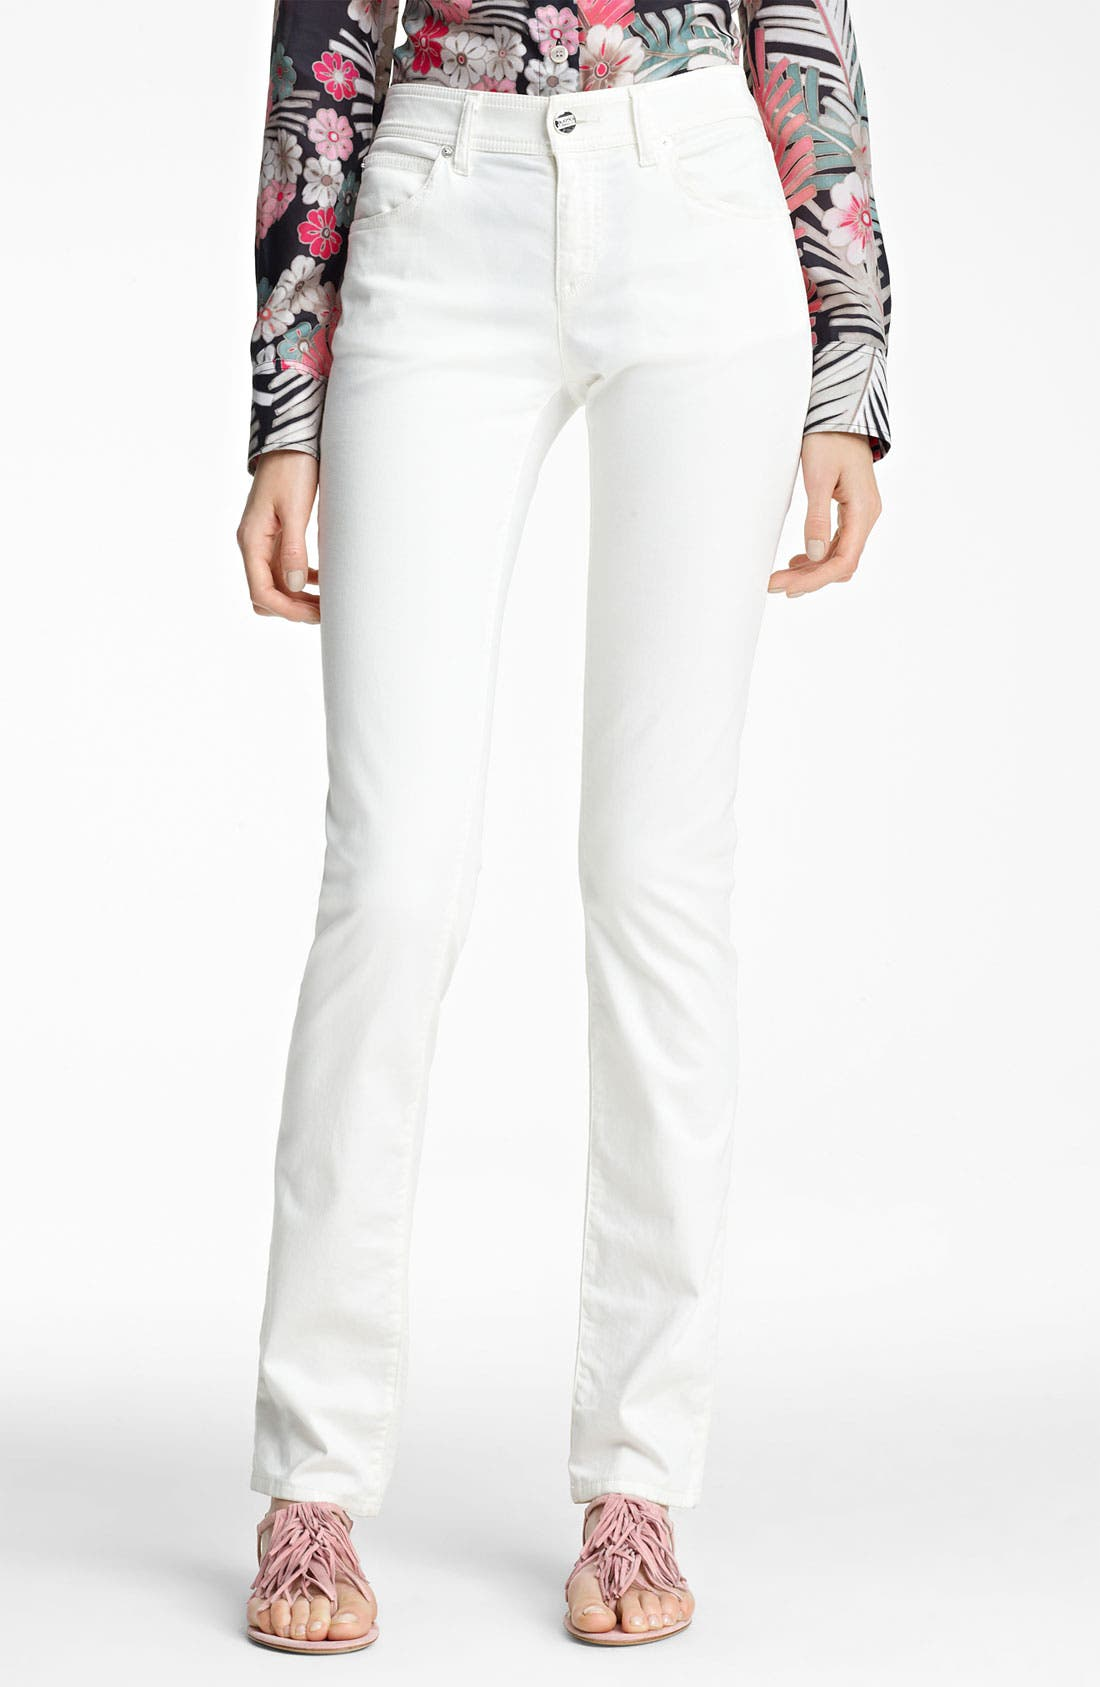 Main Image - Armani Collezioni High Waist Stretch Jeans